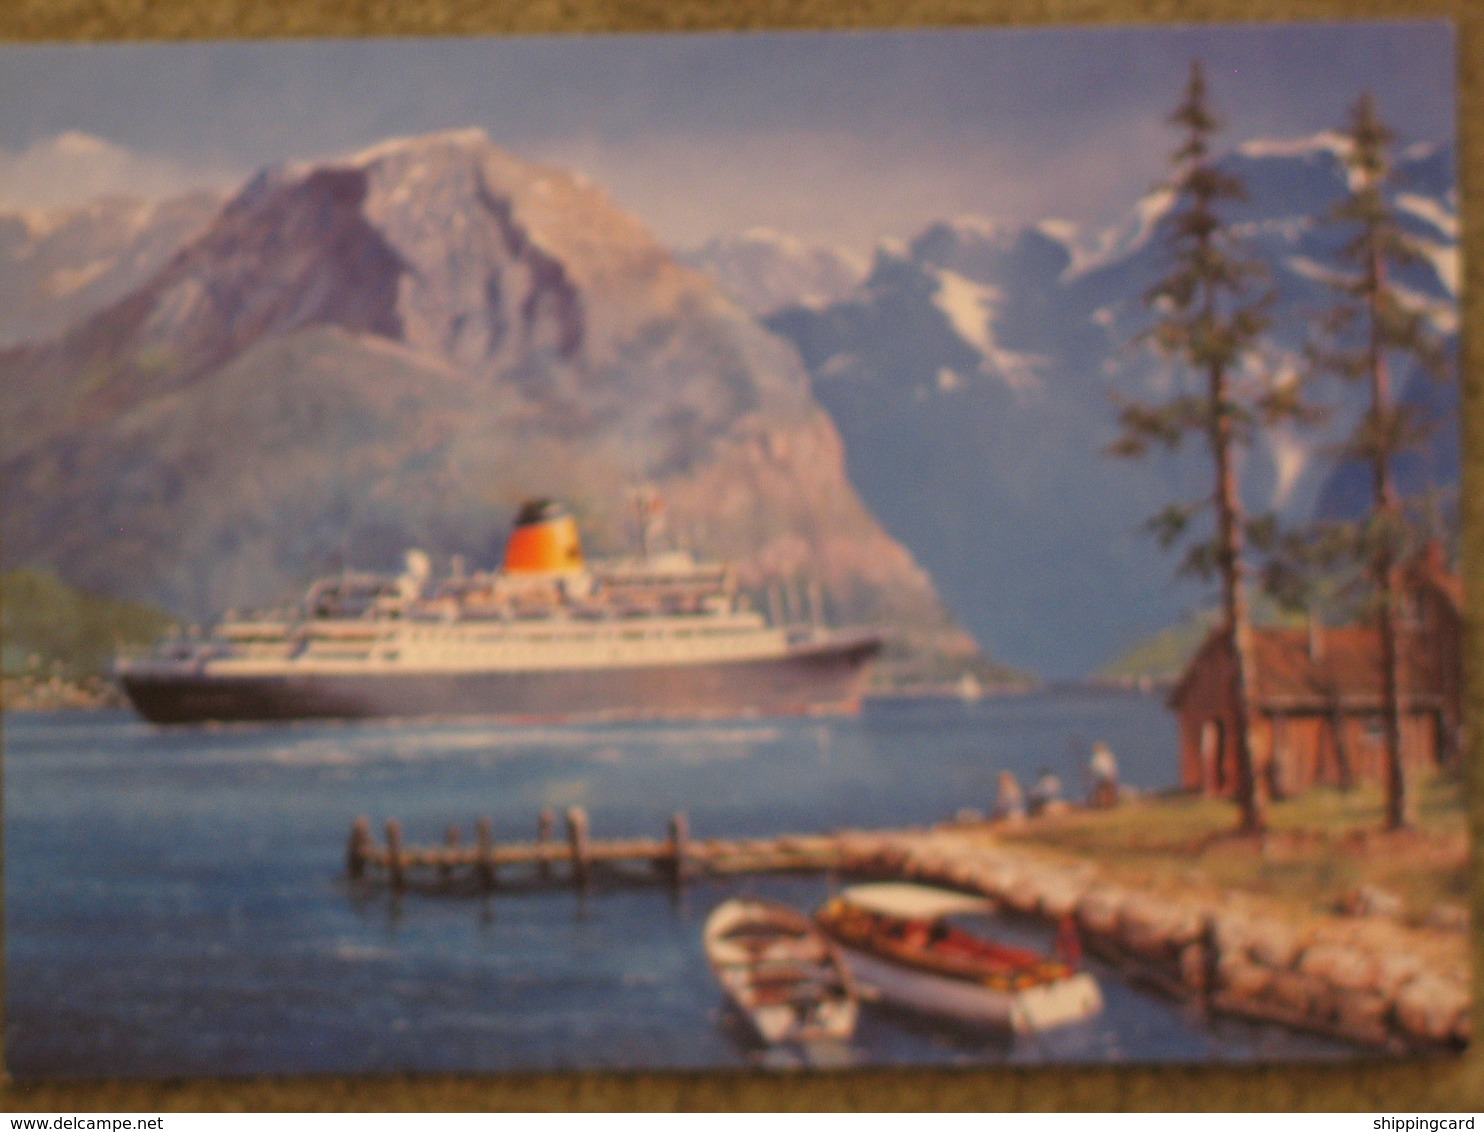 SAGA LINE SAGA ROSE VISITS NORWAY OFFICIAL - Dampfer